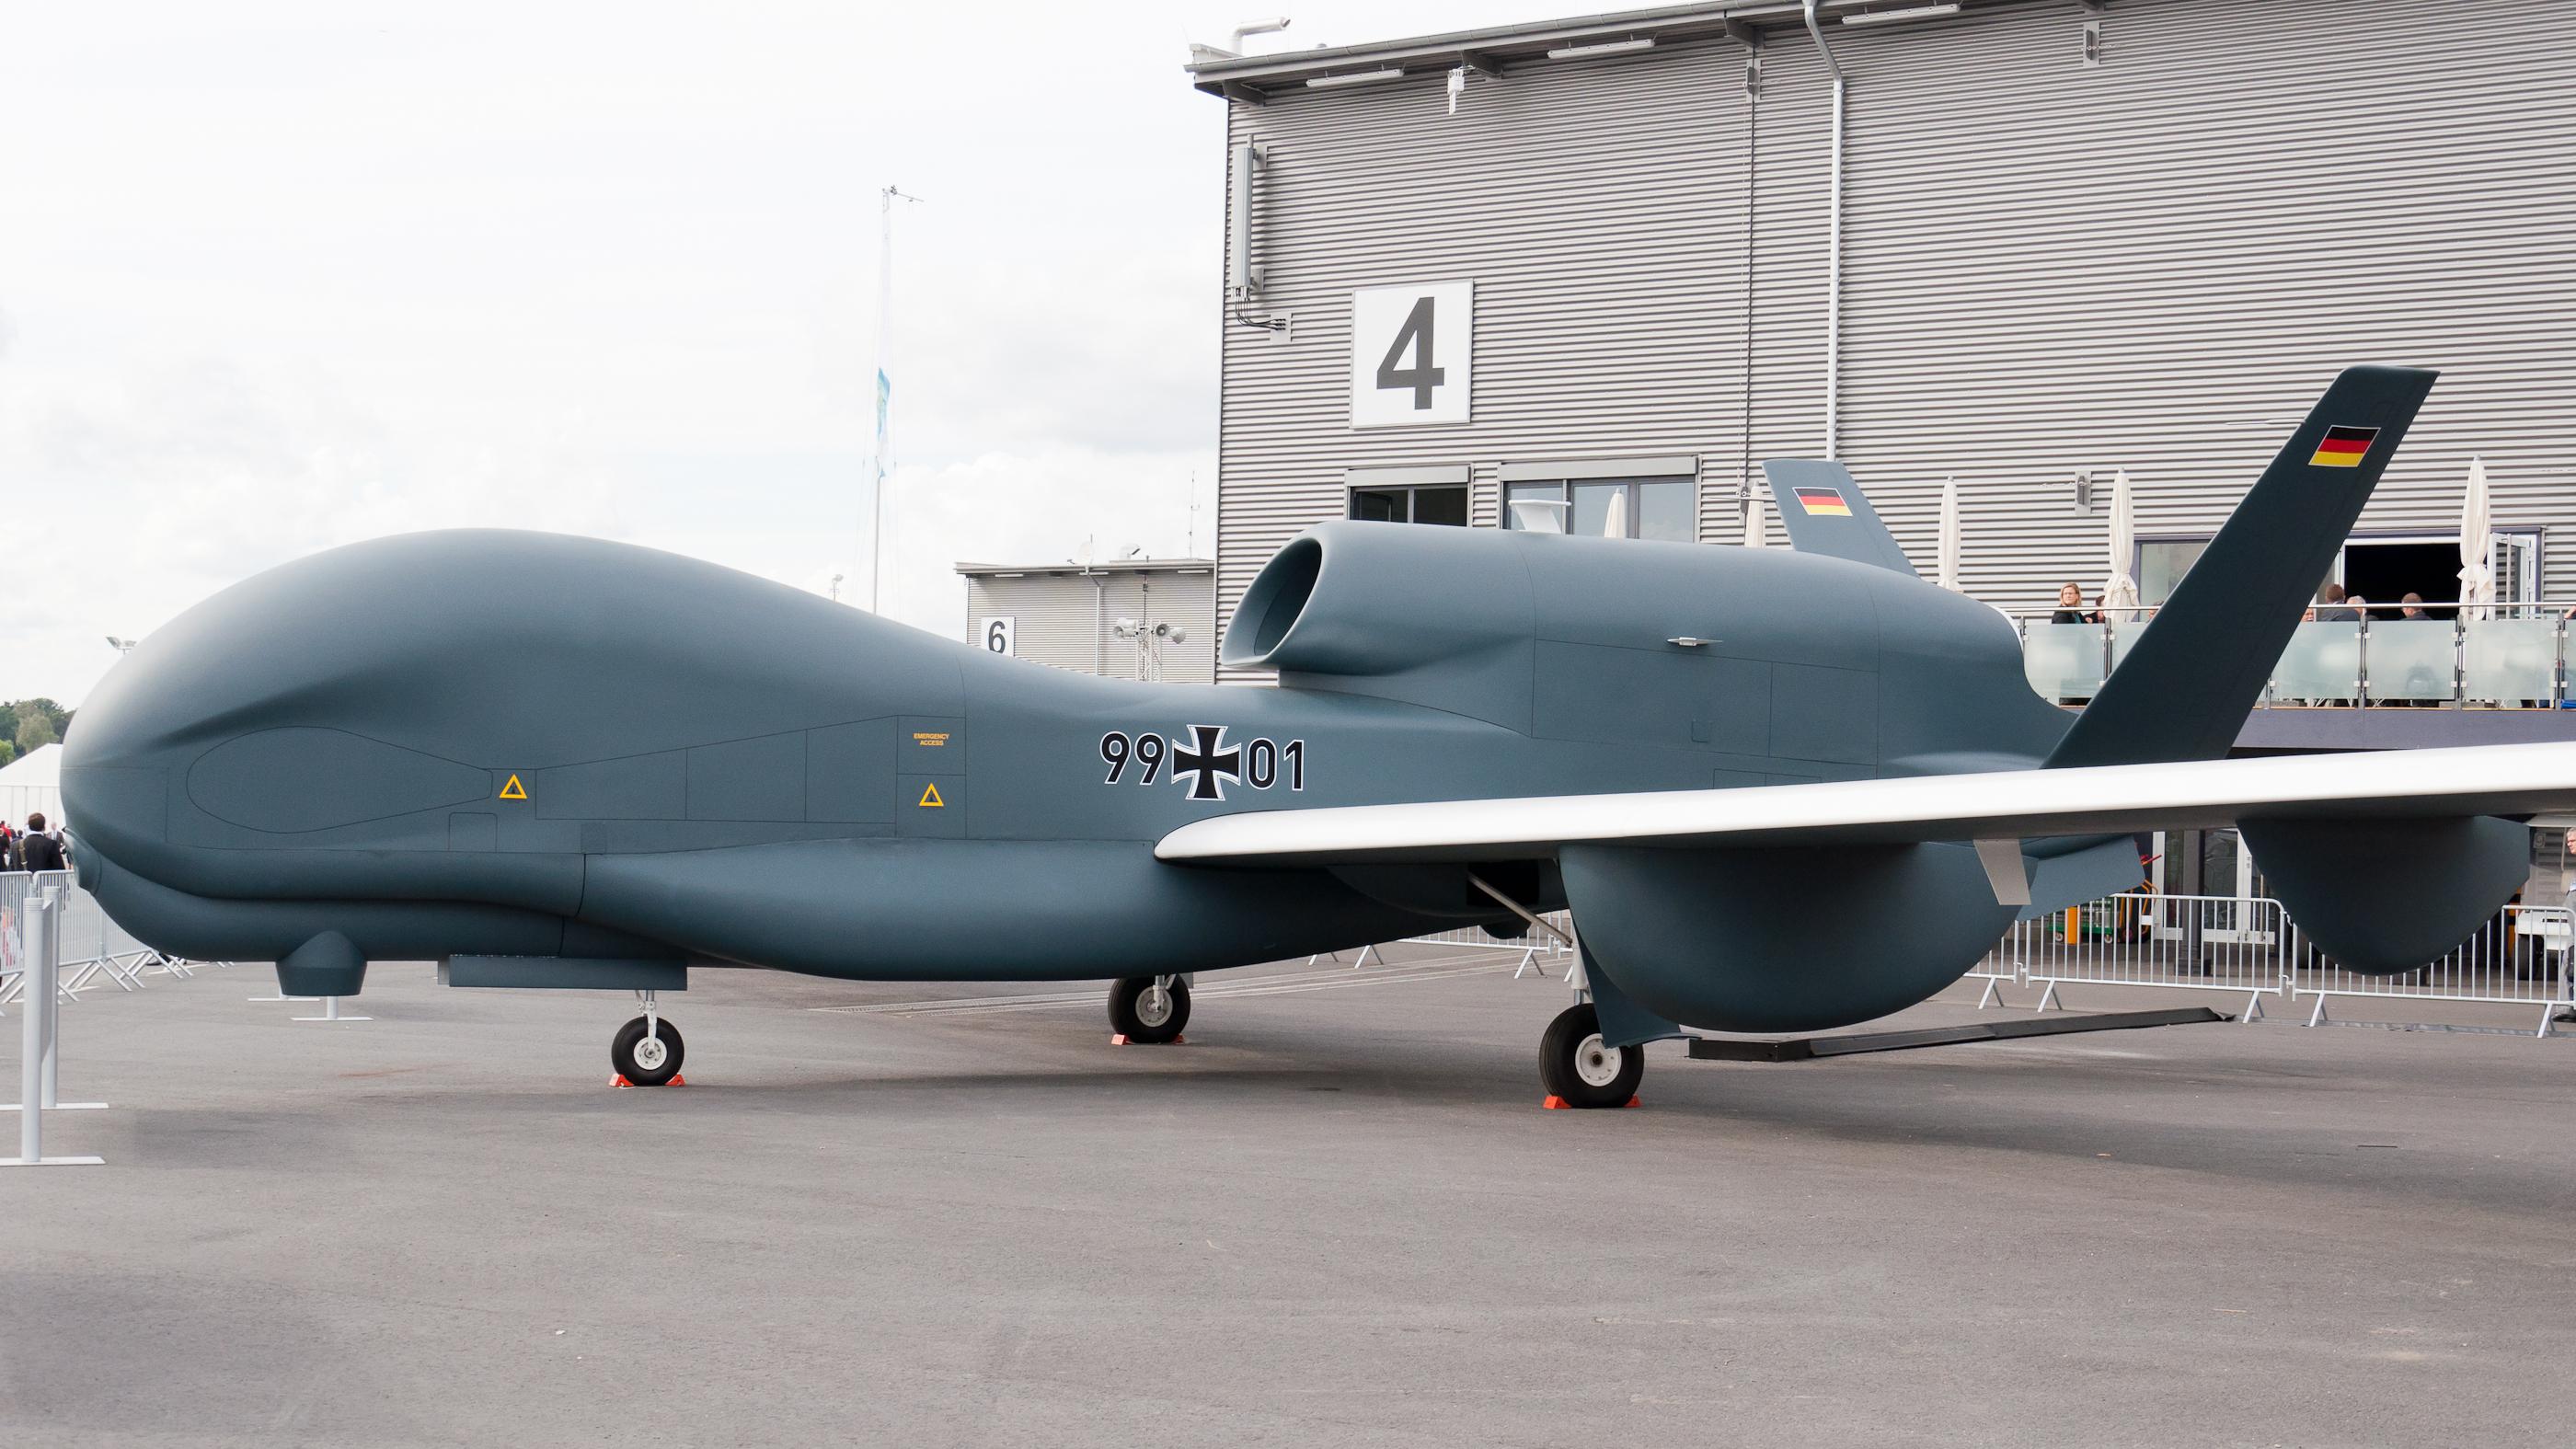 File:Luftwaffe 99-01 RQ-4B EuroHawk ILA 2012 1.jpg - Wikimedia Commons